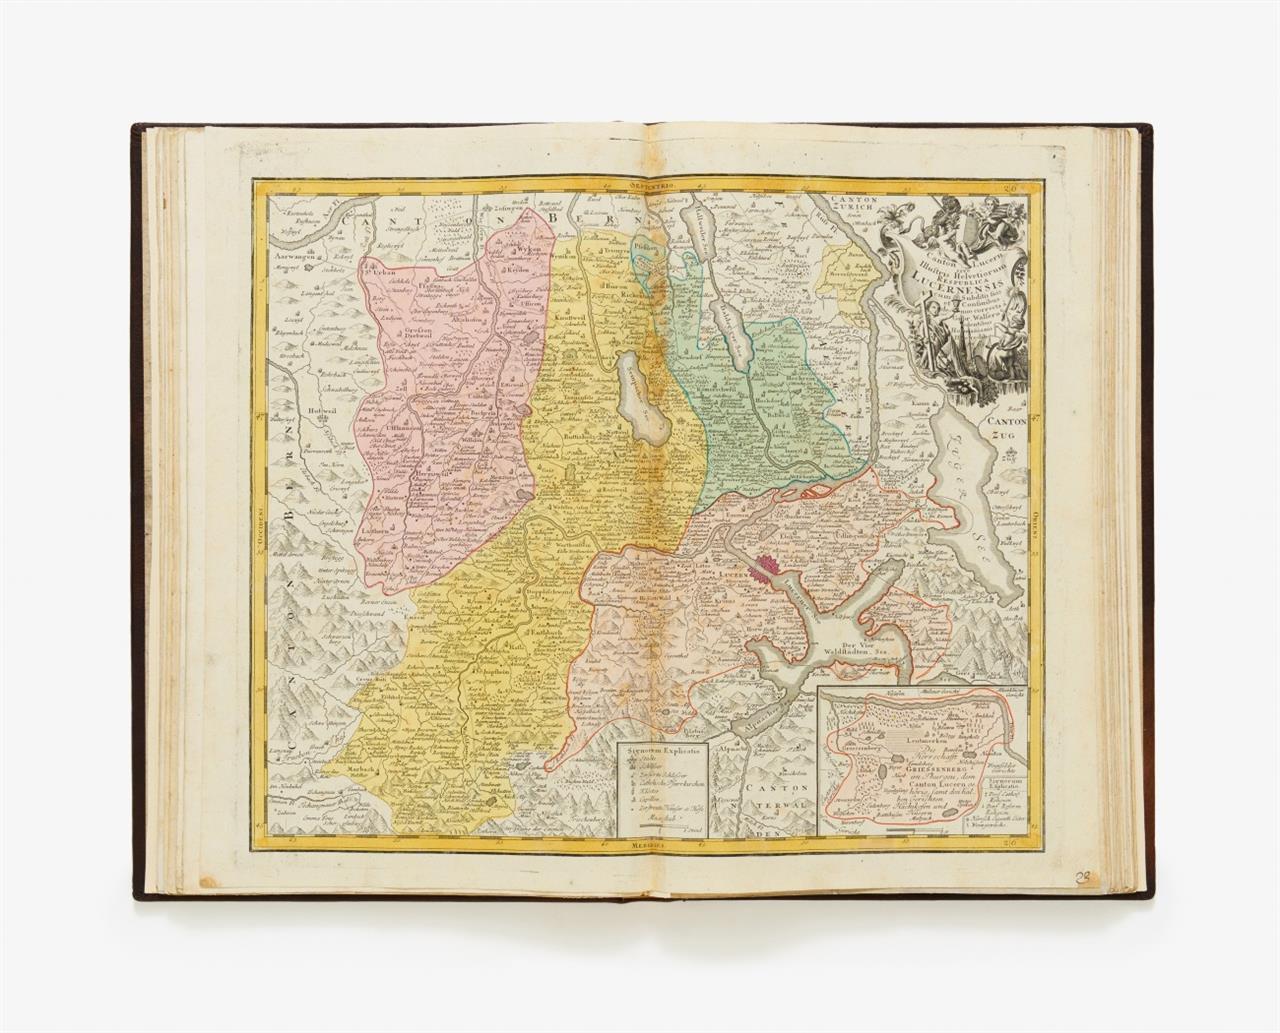 Sammelatlas. Europa u. Welt. Nürnberg, Homann u. Homann Erben, 18. Jh. - 50 kolor. Kupferkarten.